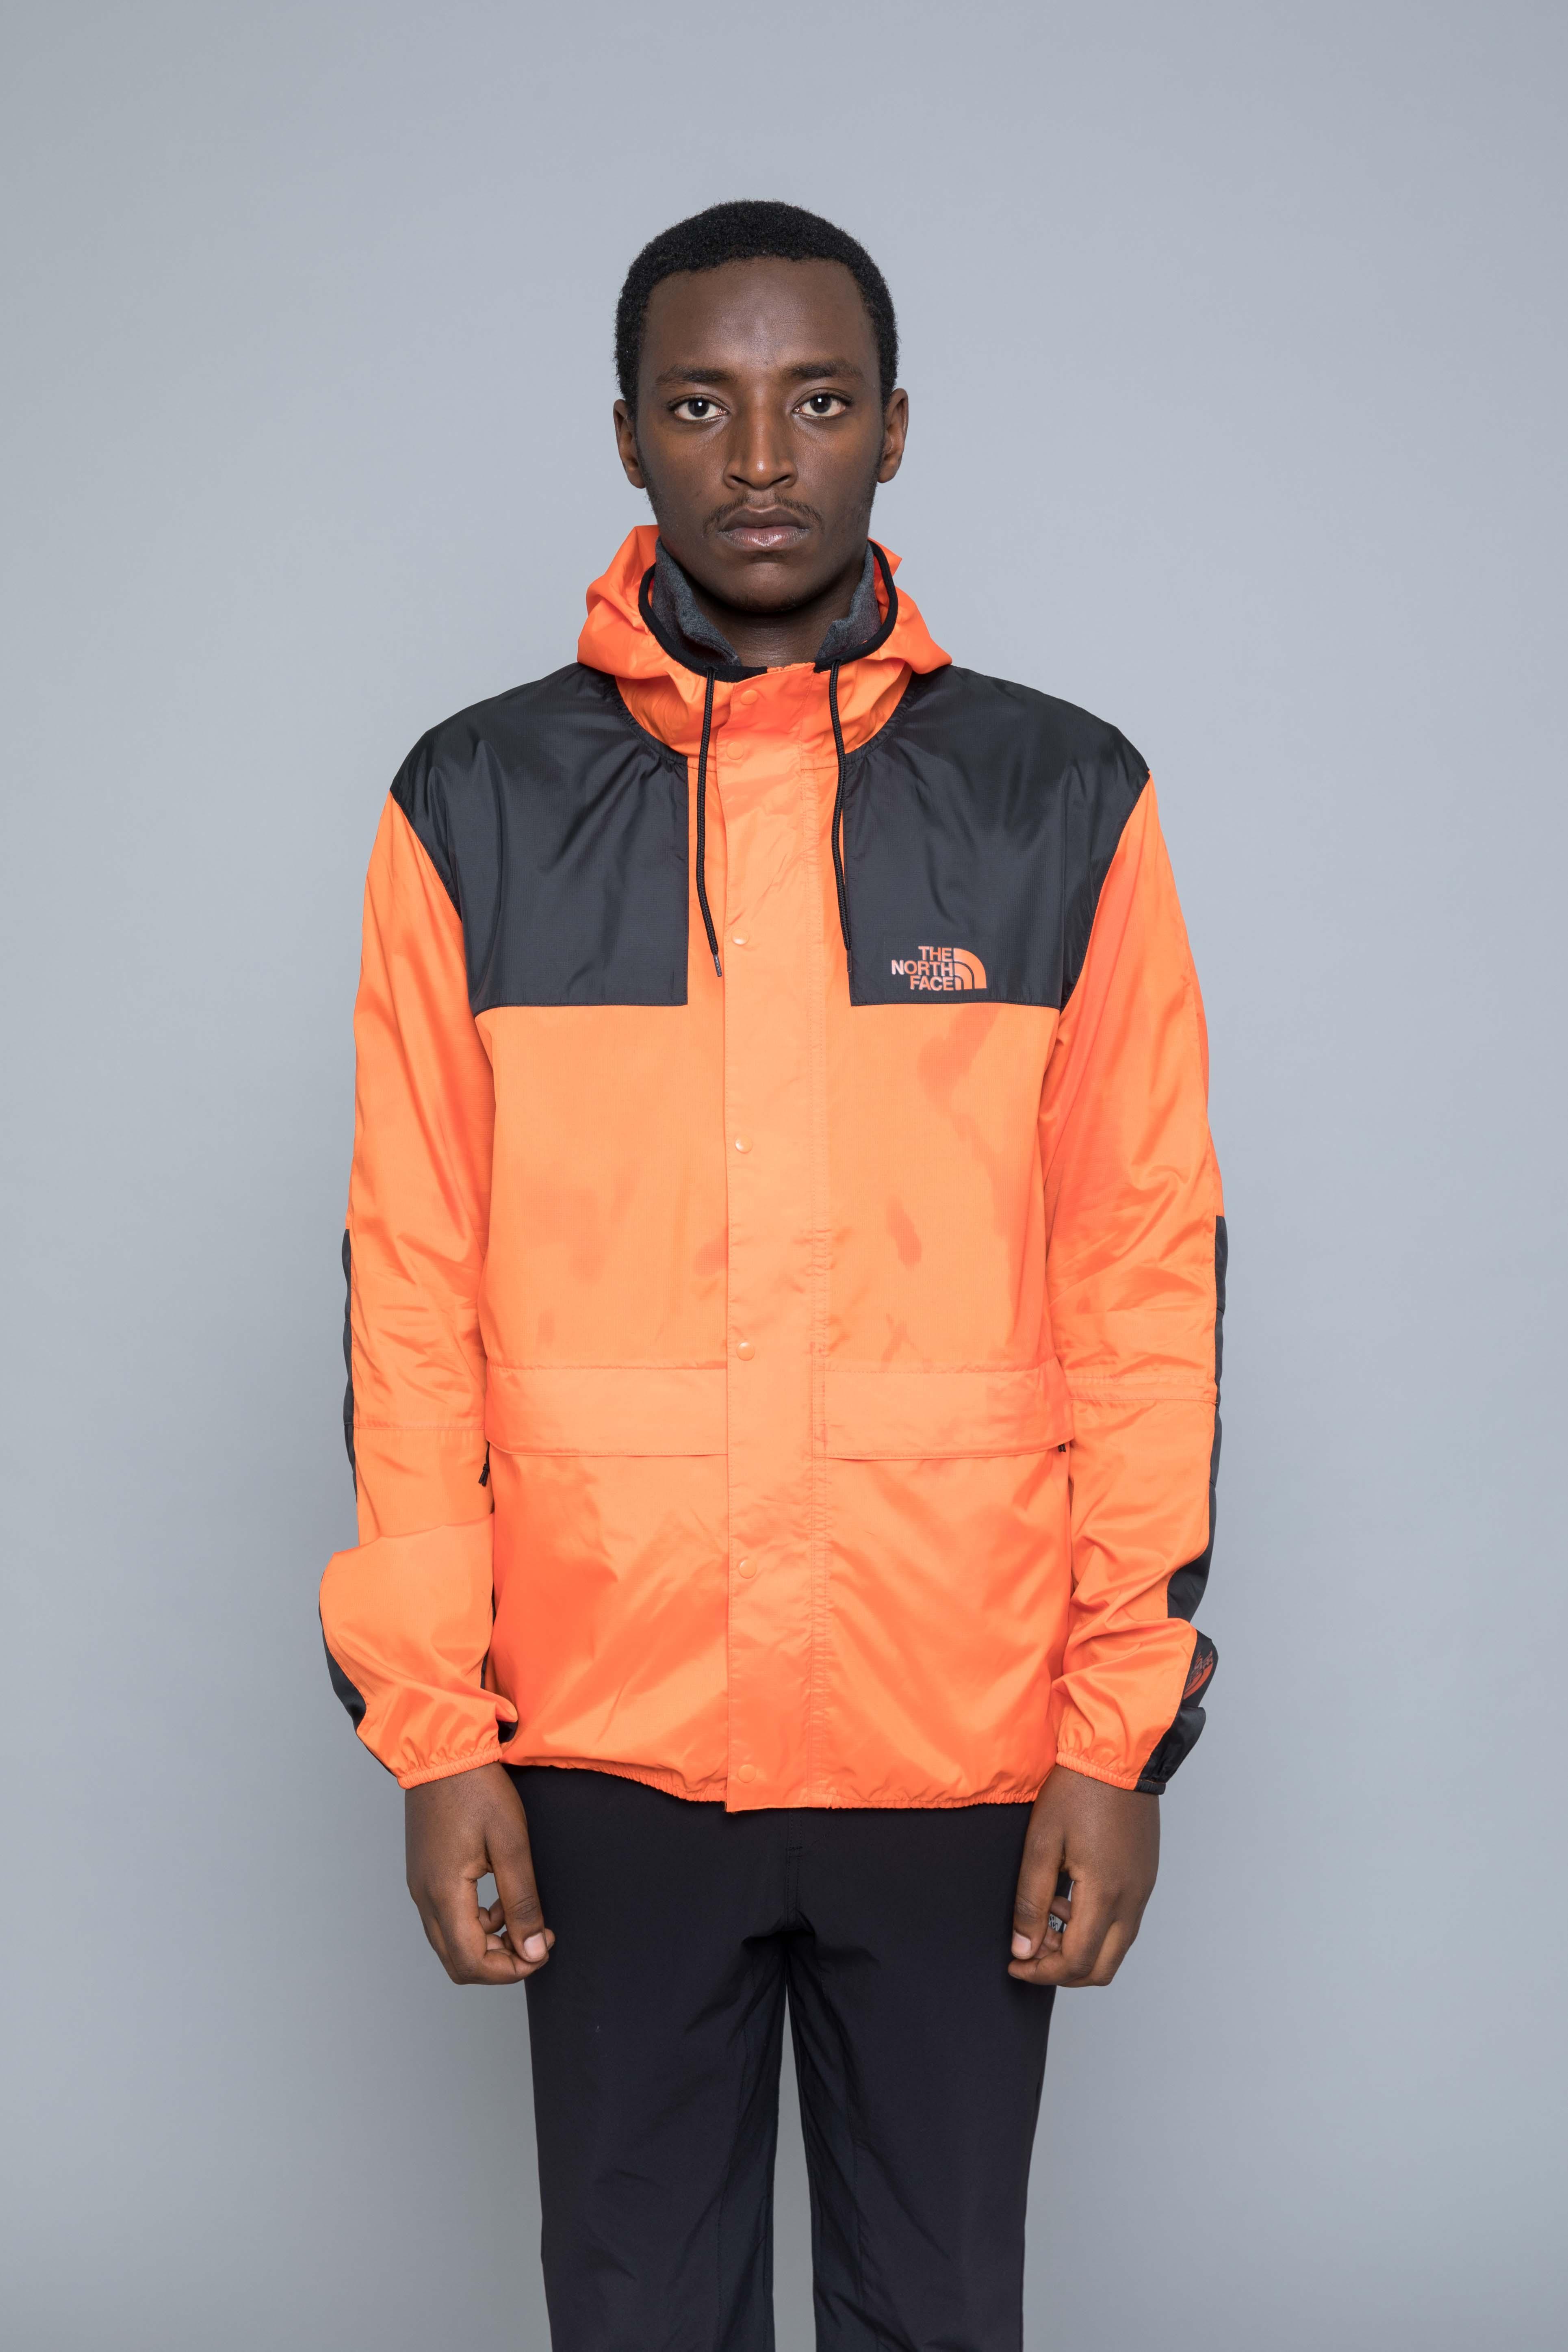 c9e6ad63f0b5 The North Face 1985 Mountain Jacket Persian Orange • Centreville Store